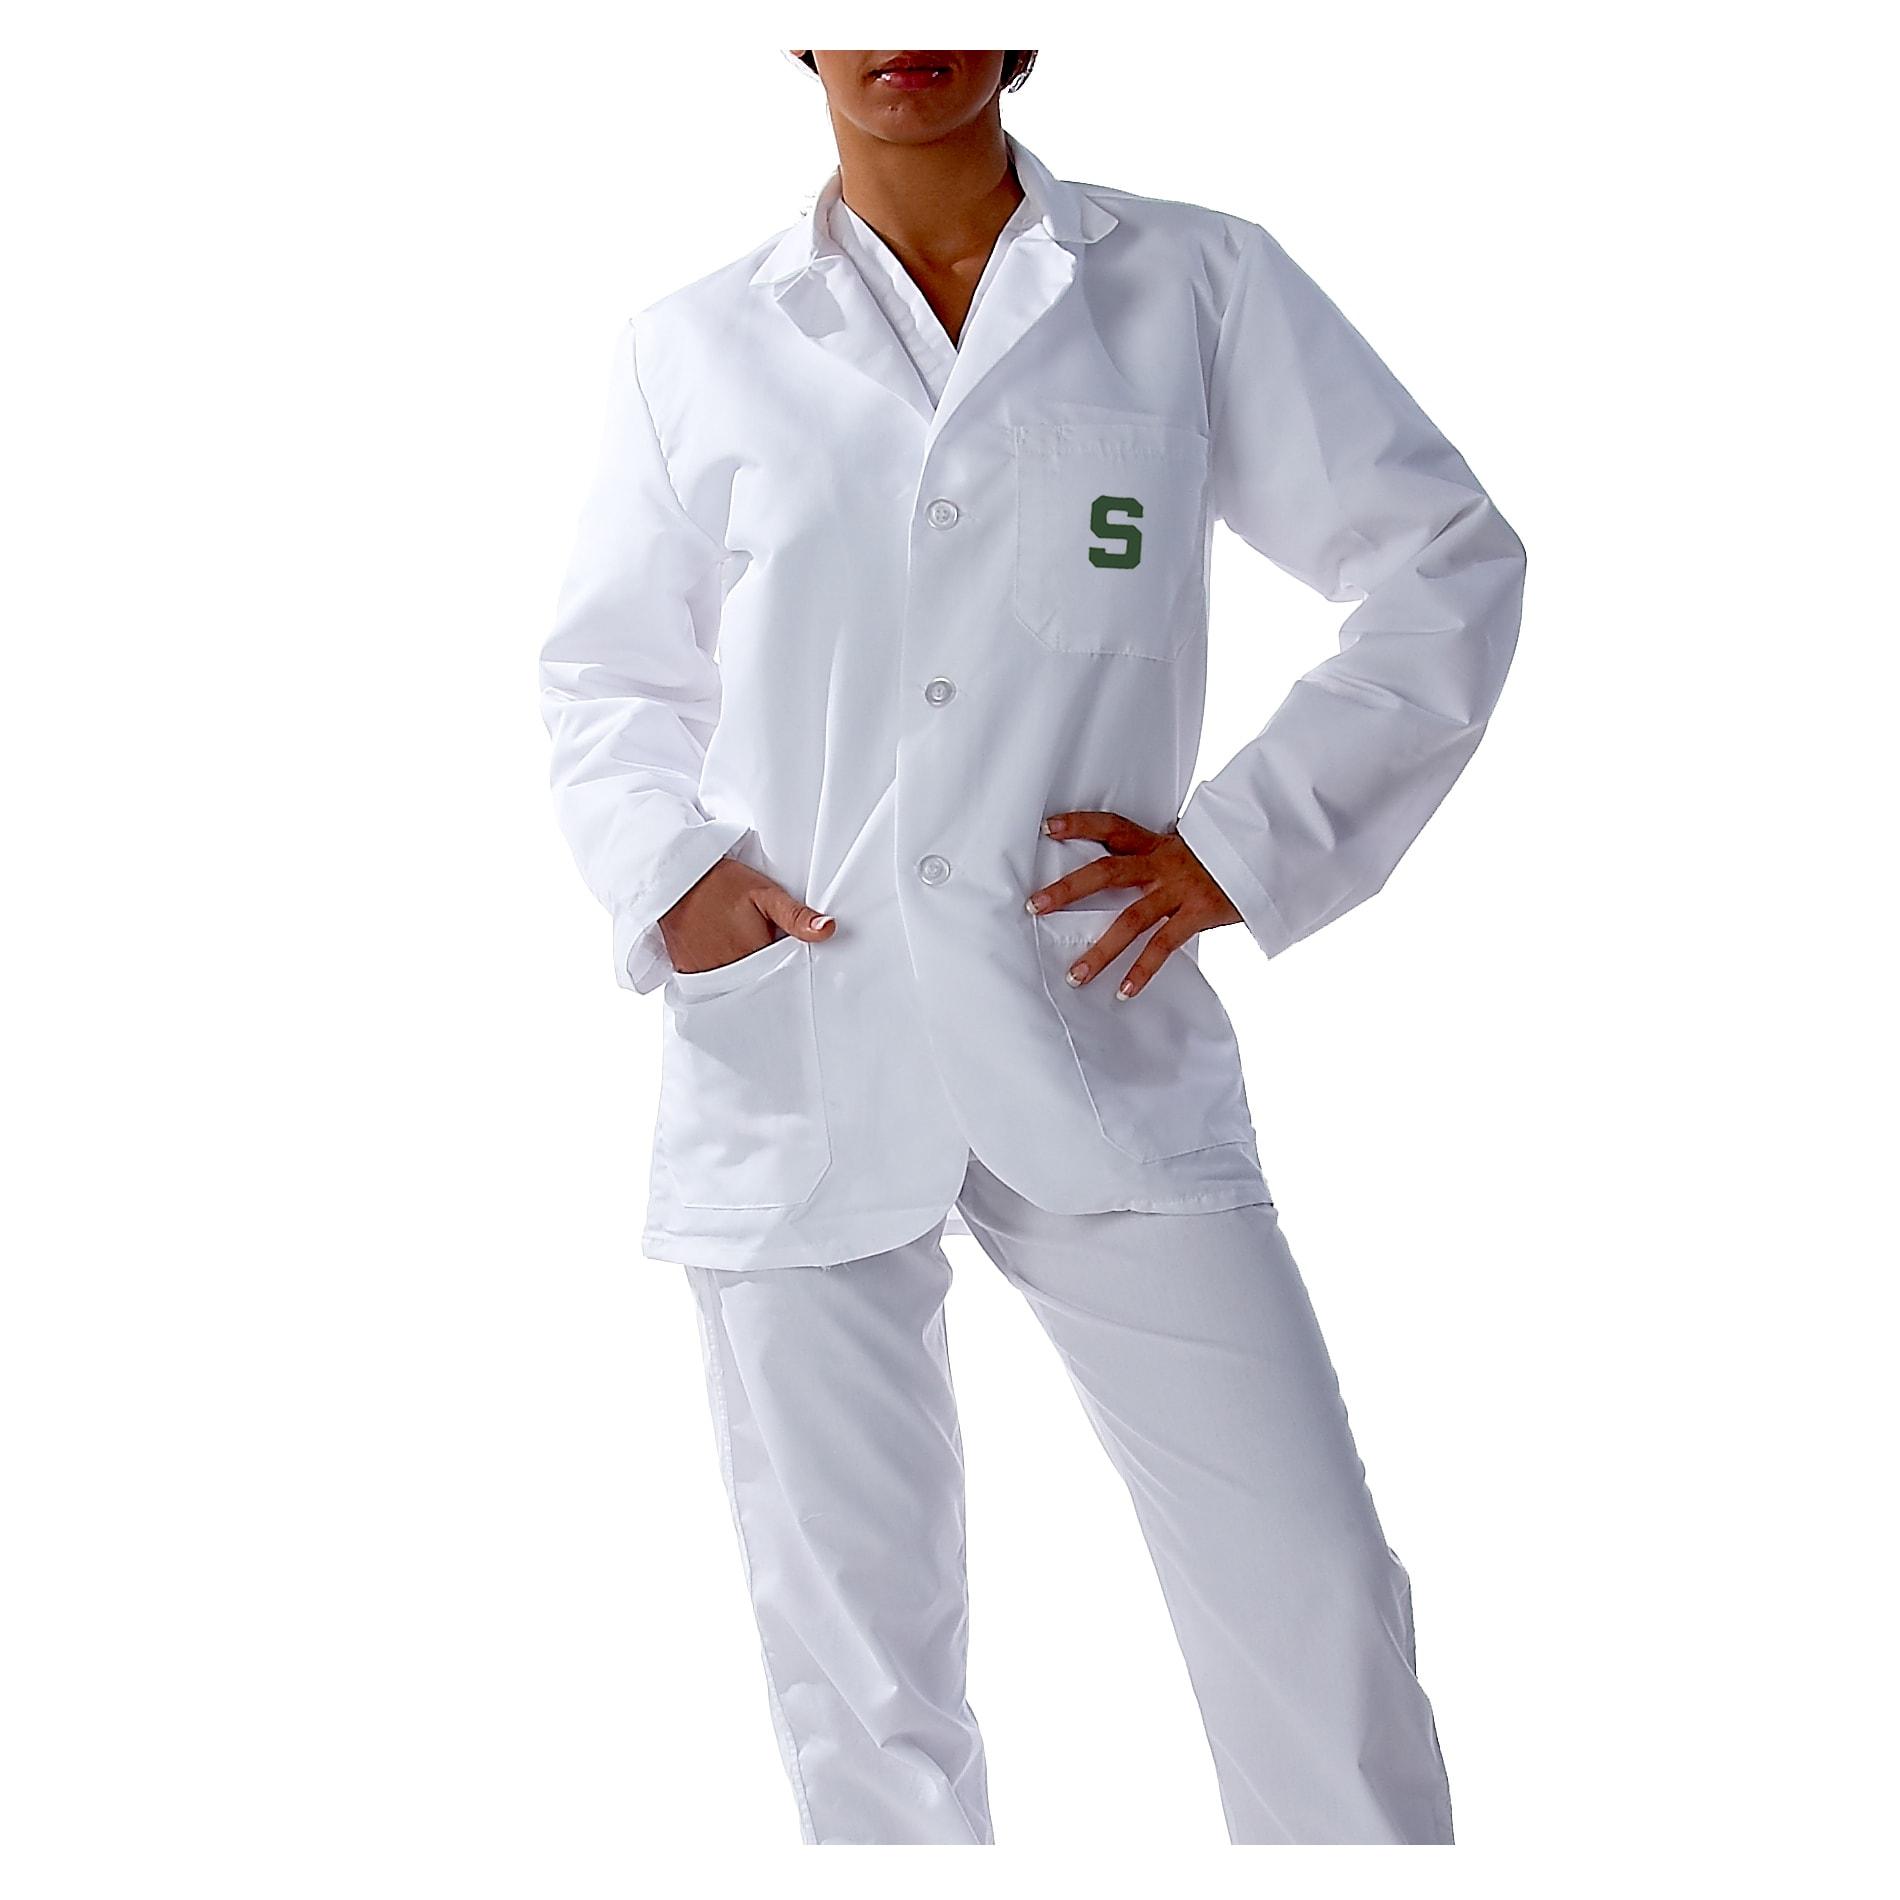 Gelscrubs Machine-Washable Unisex NCAA Michigan Wolverines Short Labcoat